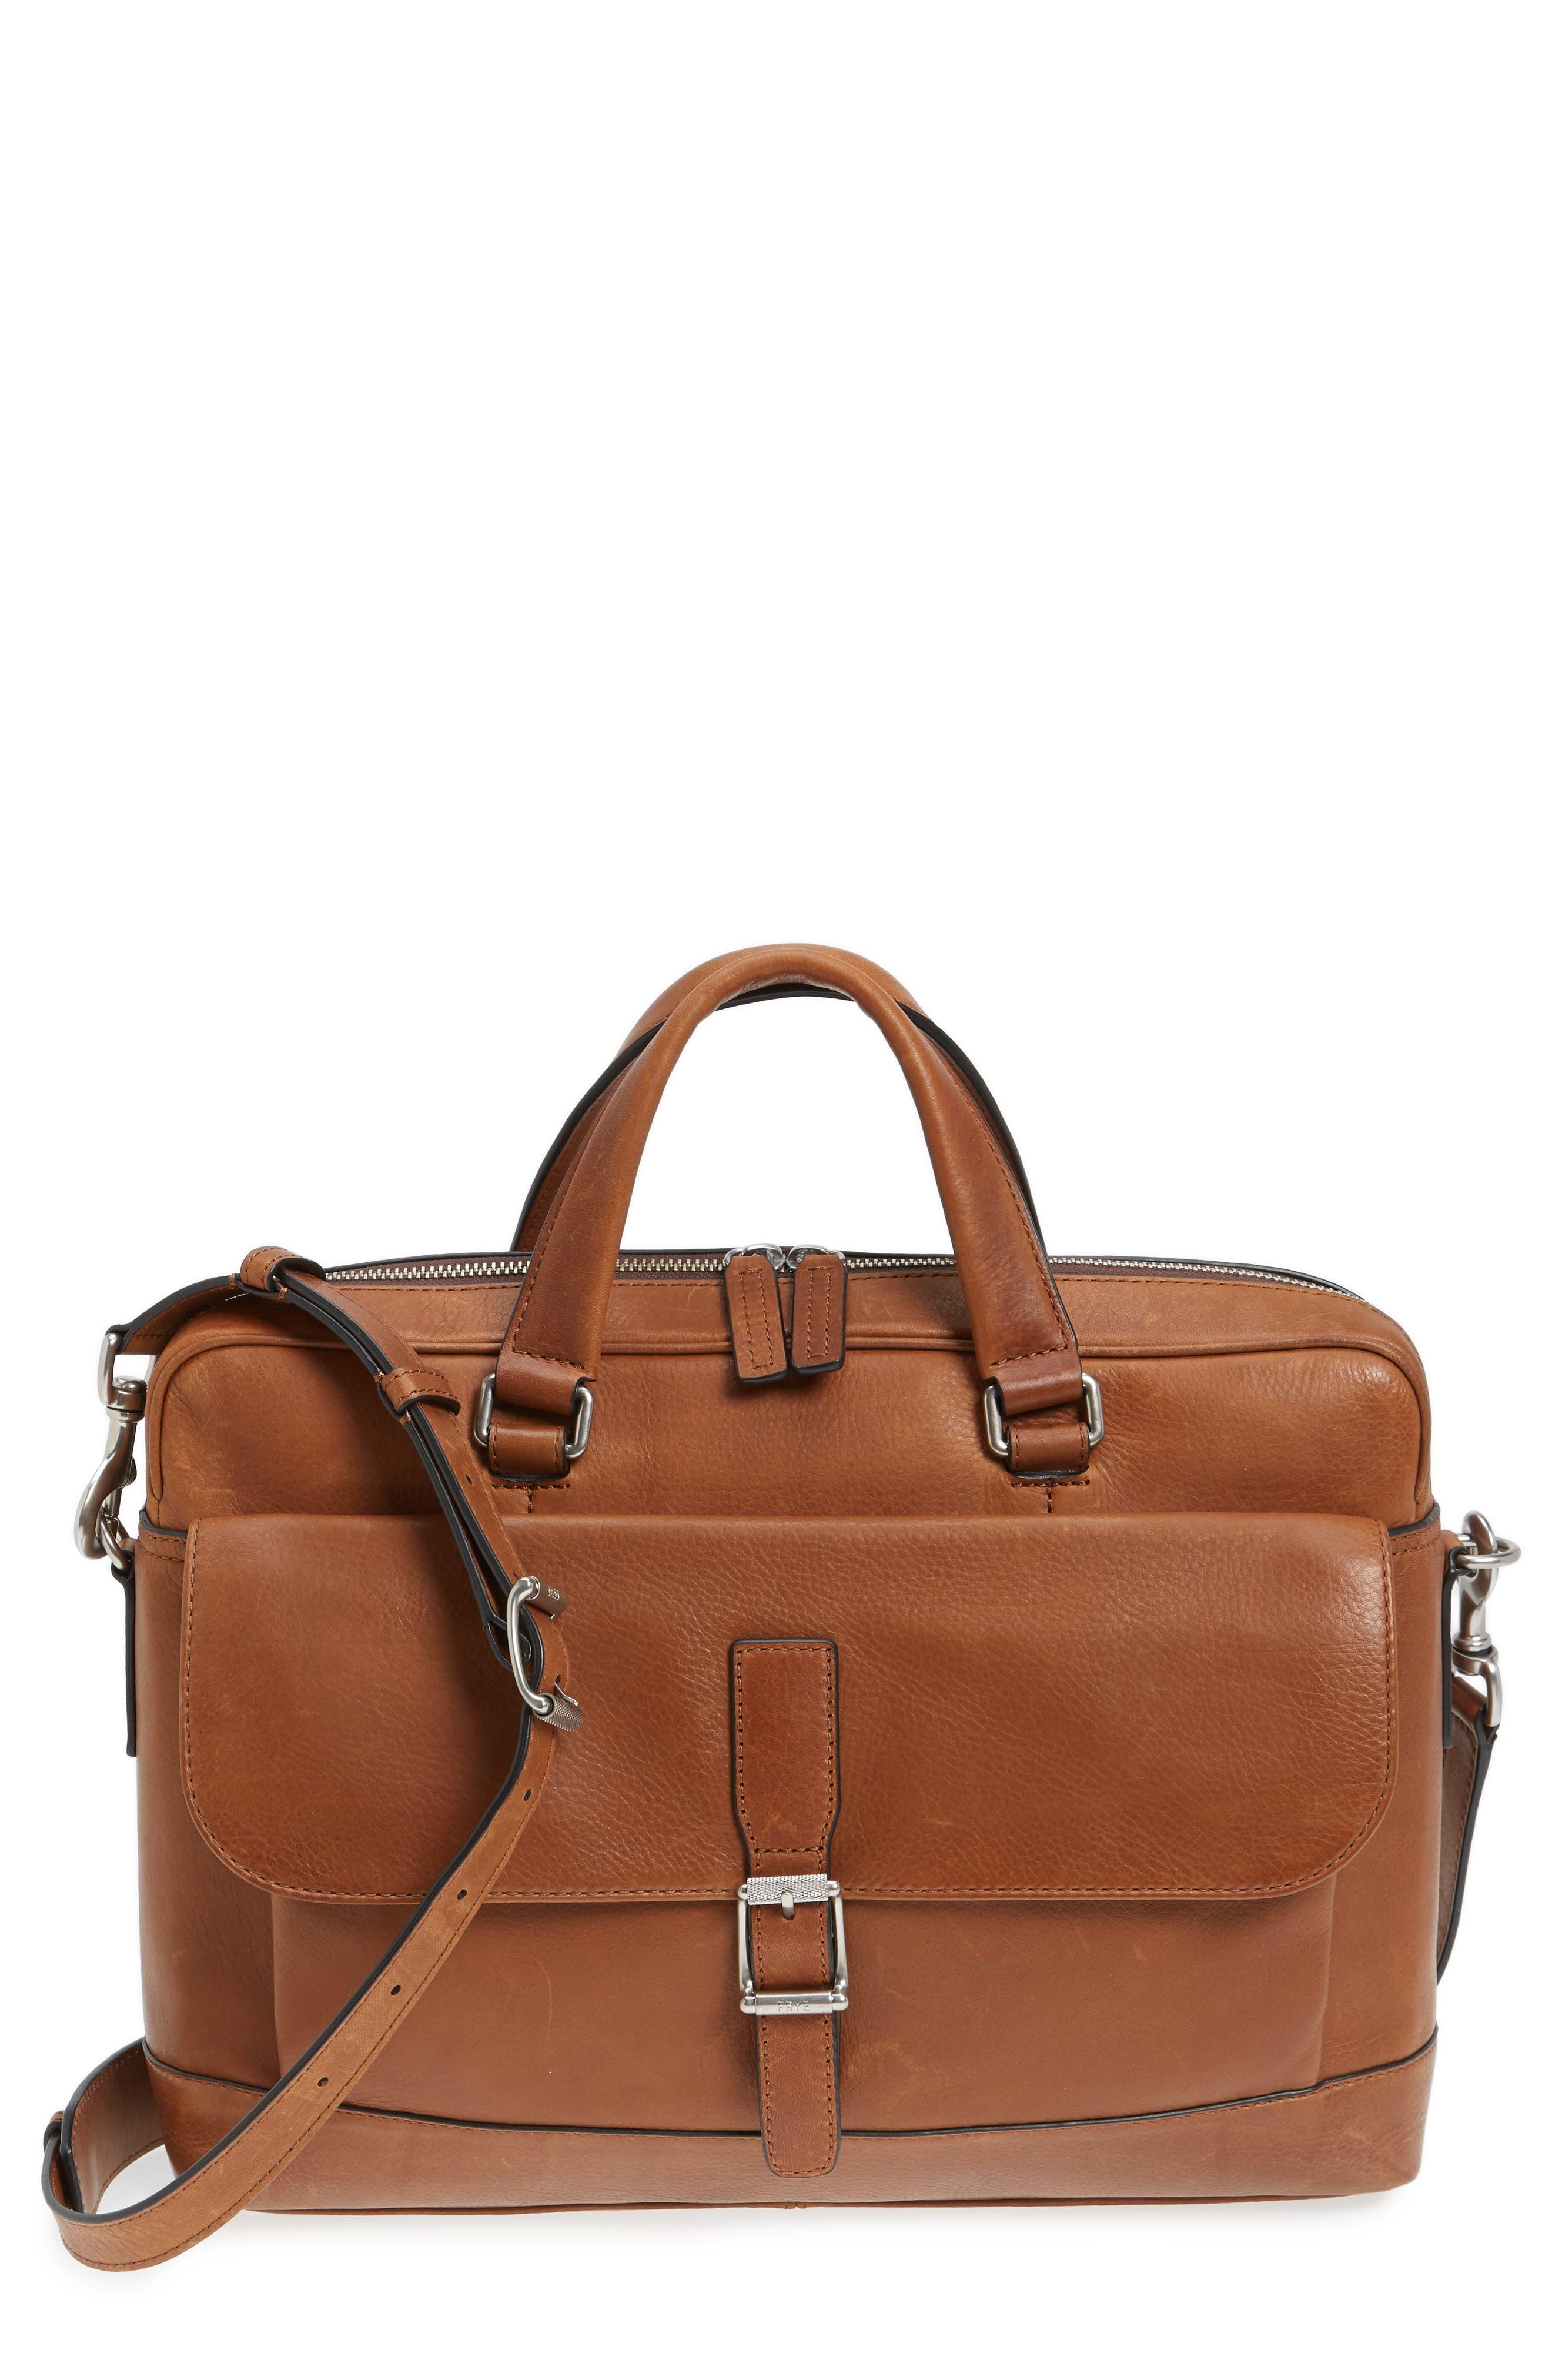 FRYE Oliver Leather Briefcase, Main, color, 235